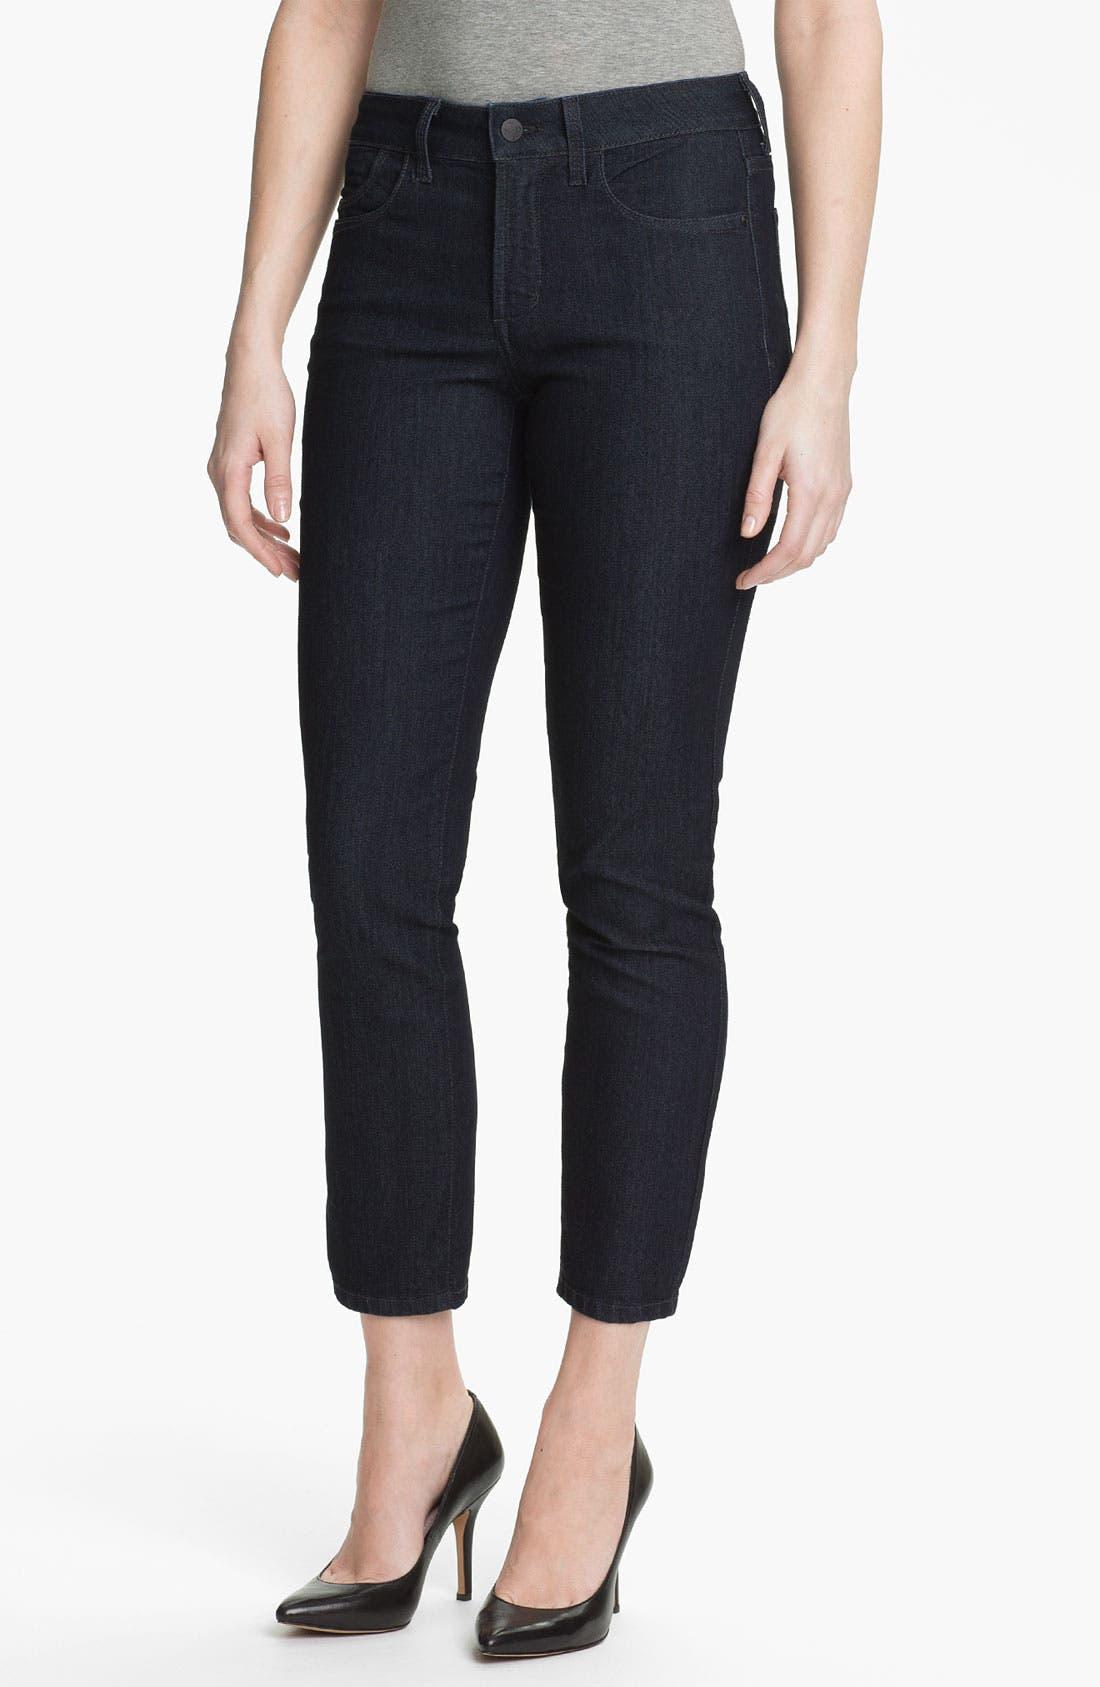 Alternate Image 1 Selected - NYDJ 'Alisha' Stretch Skinny Jeans (Petite)